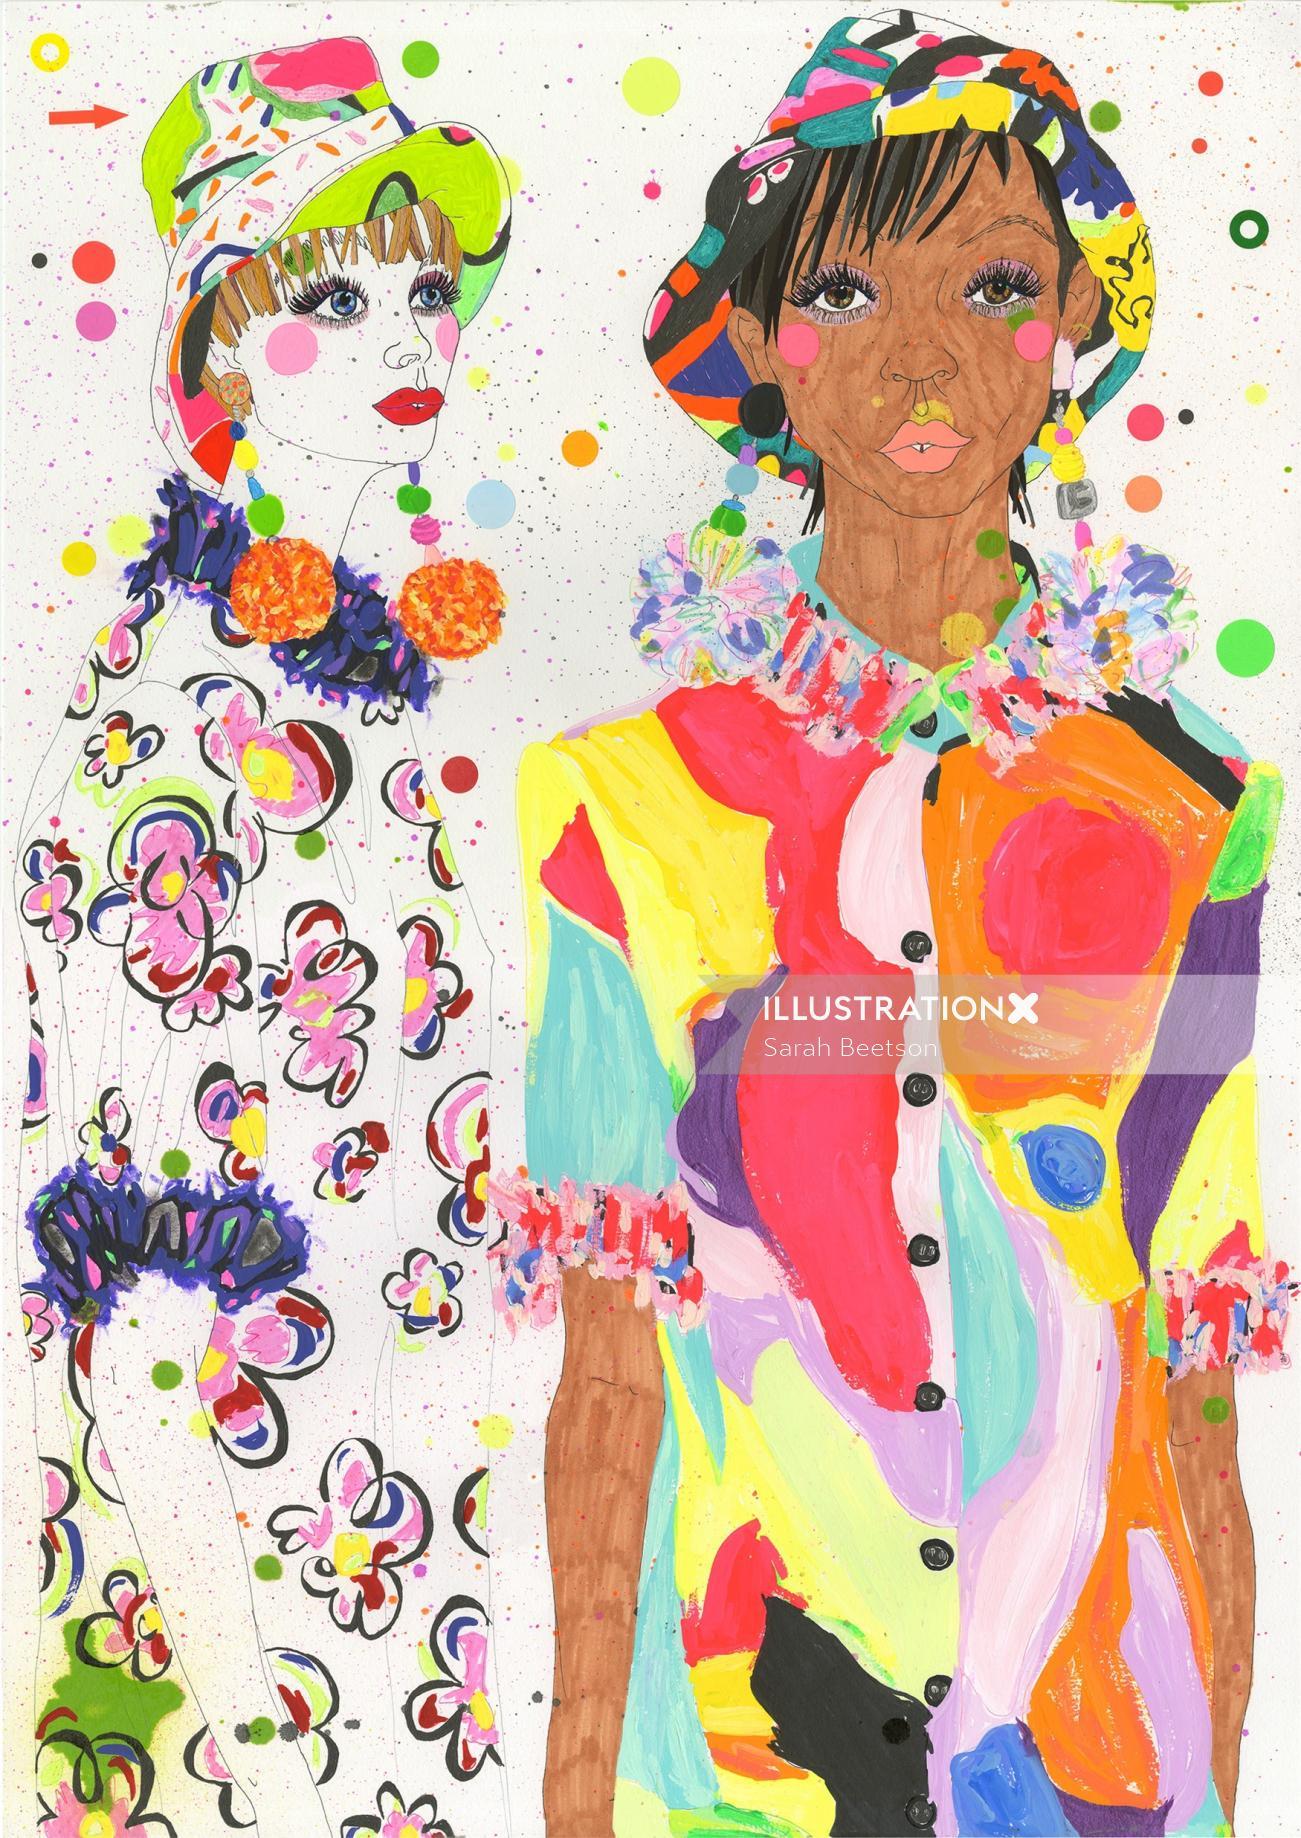 Kit Neale illustration by Sarah Beetson